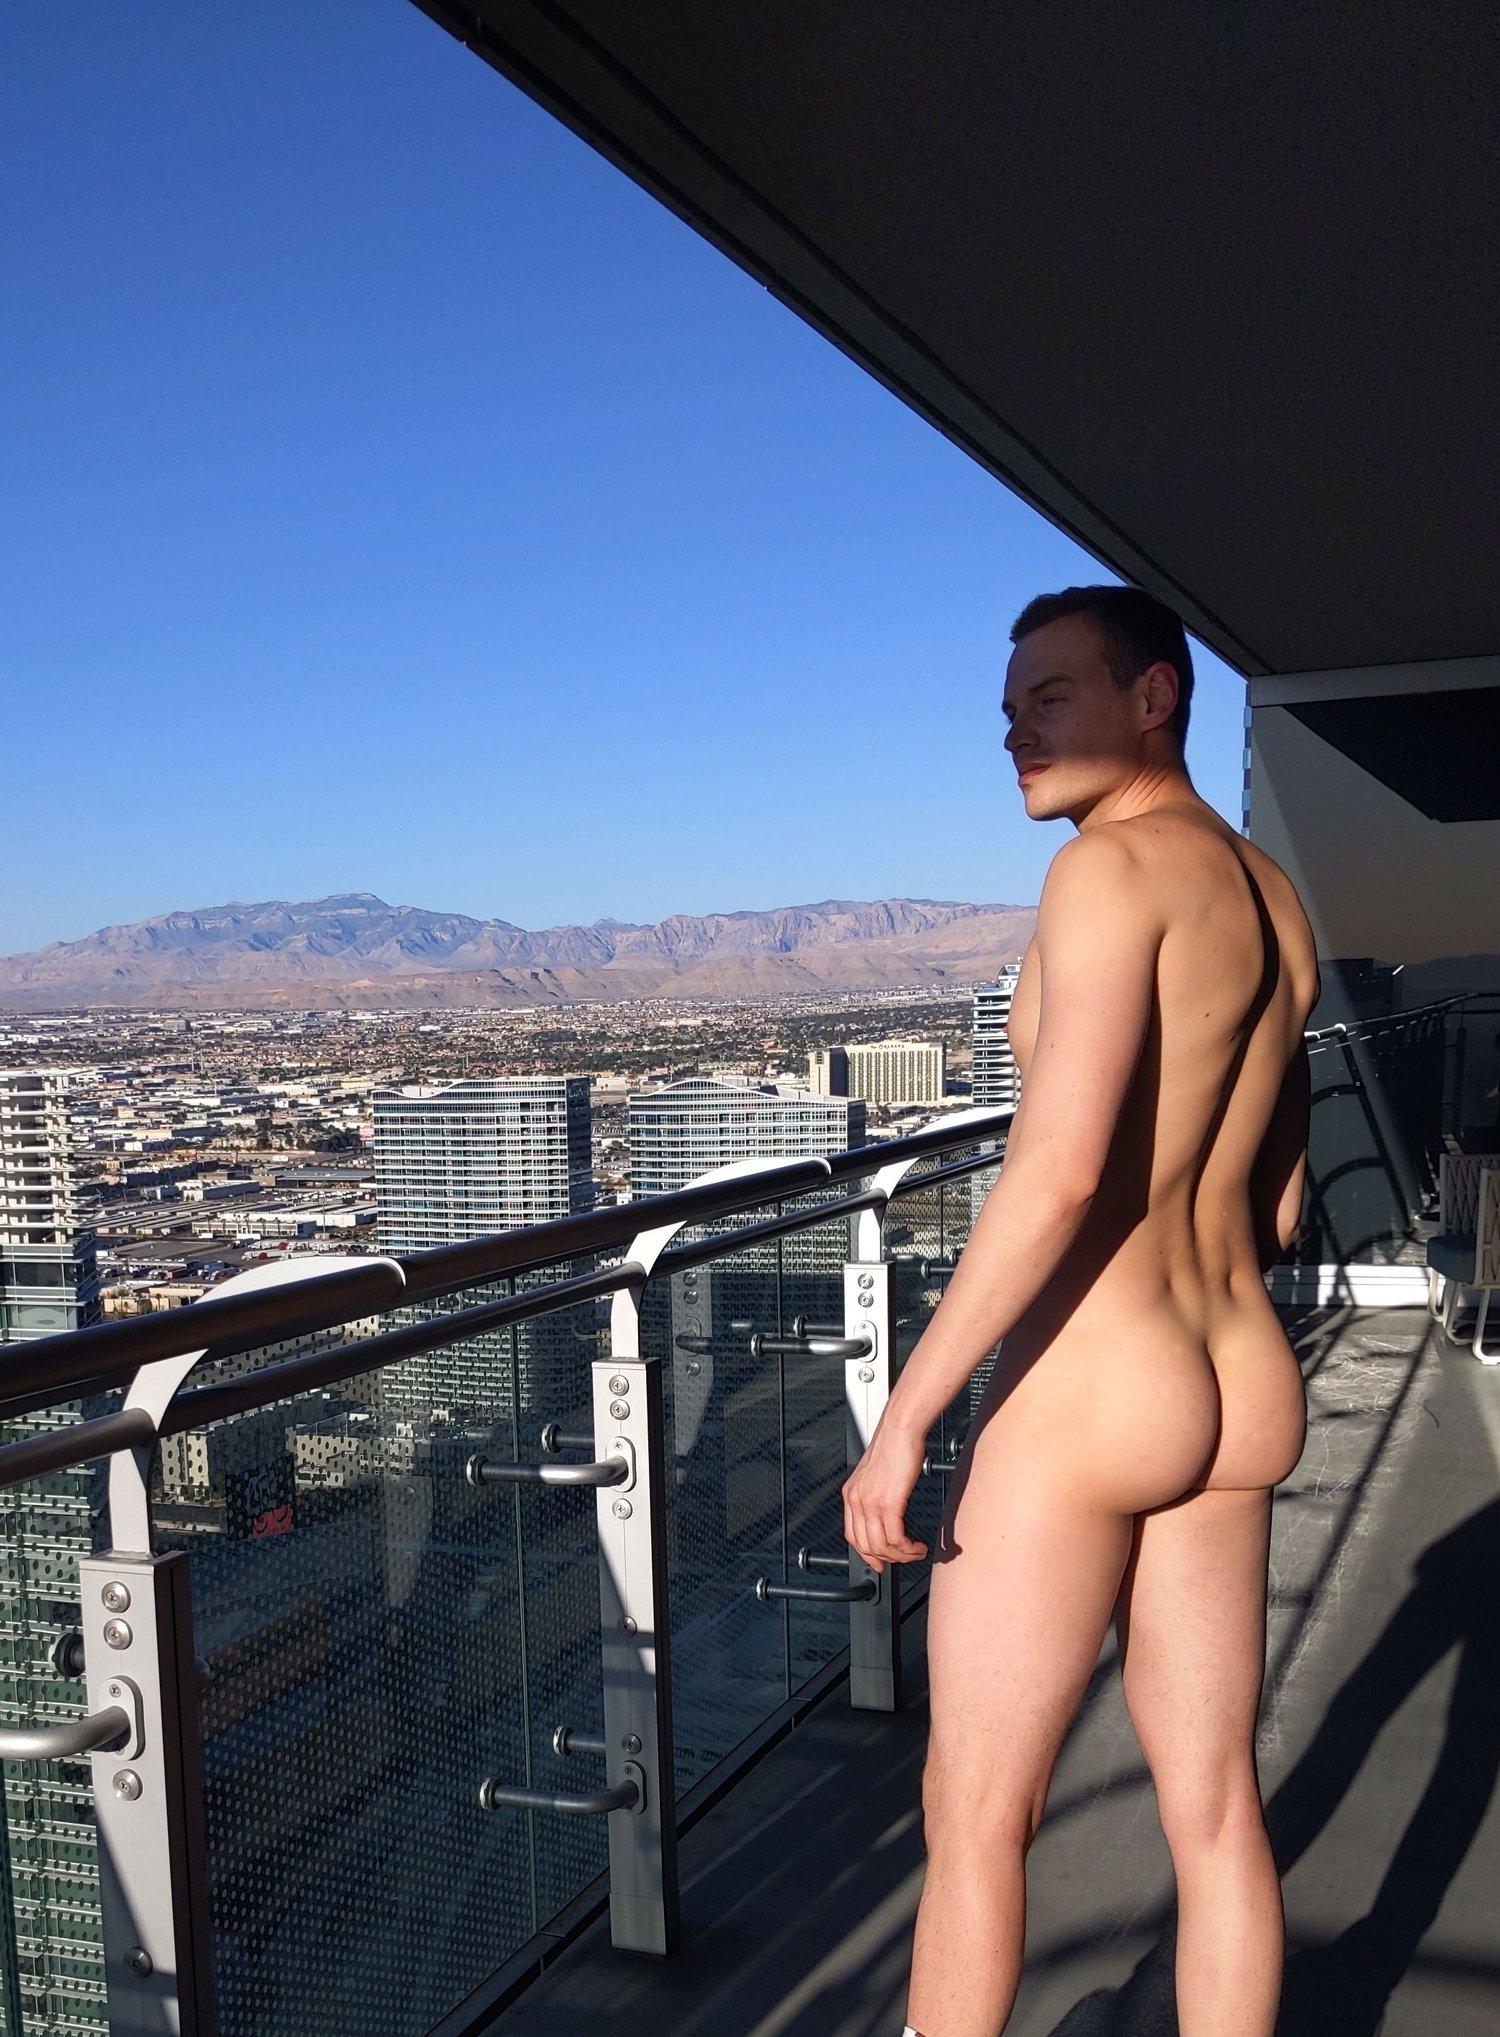 Image of Mackenzie x San Pedro - Morning View